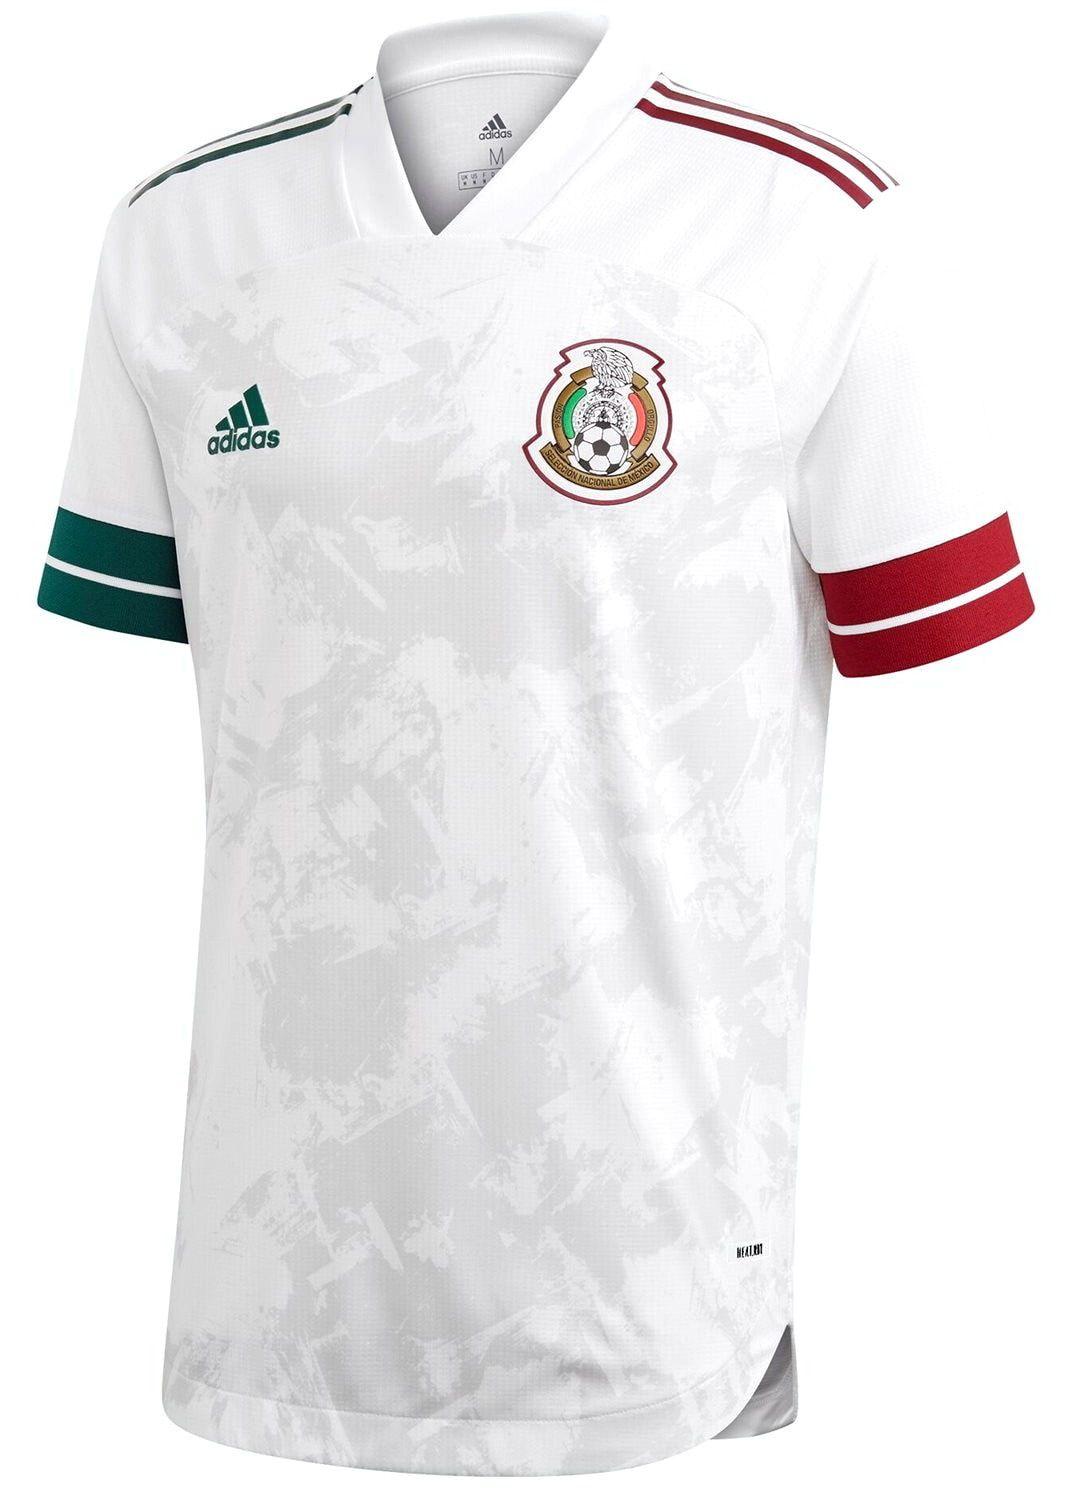 MÉXICO CAMISA JOGADOR 2020, UNIFORME RESERVA